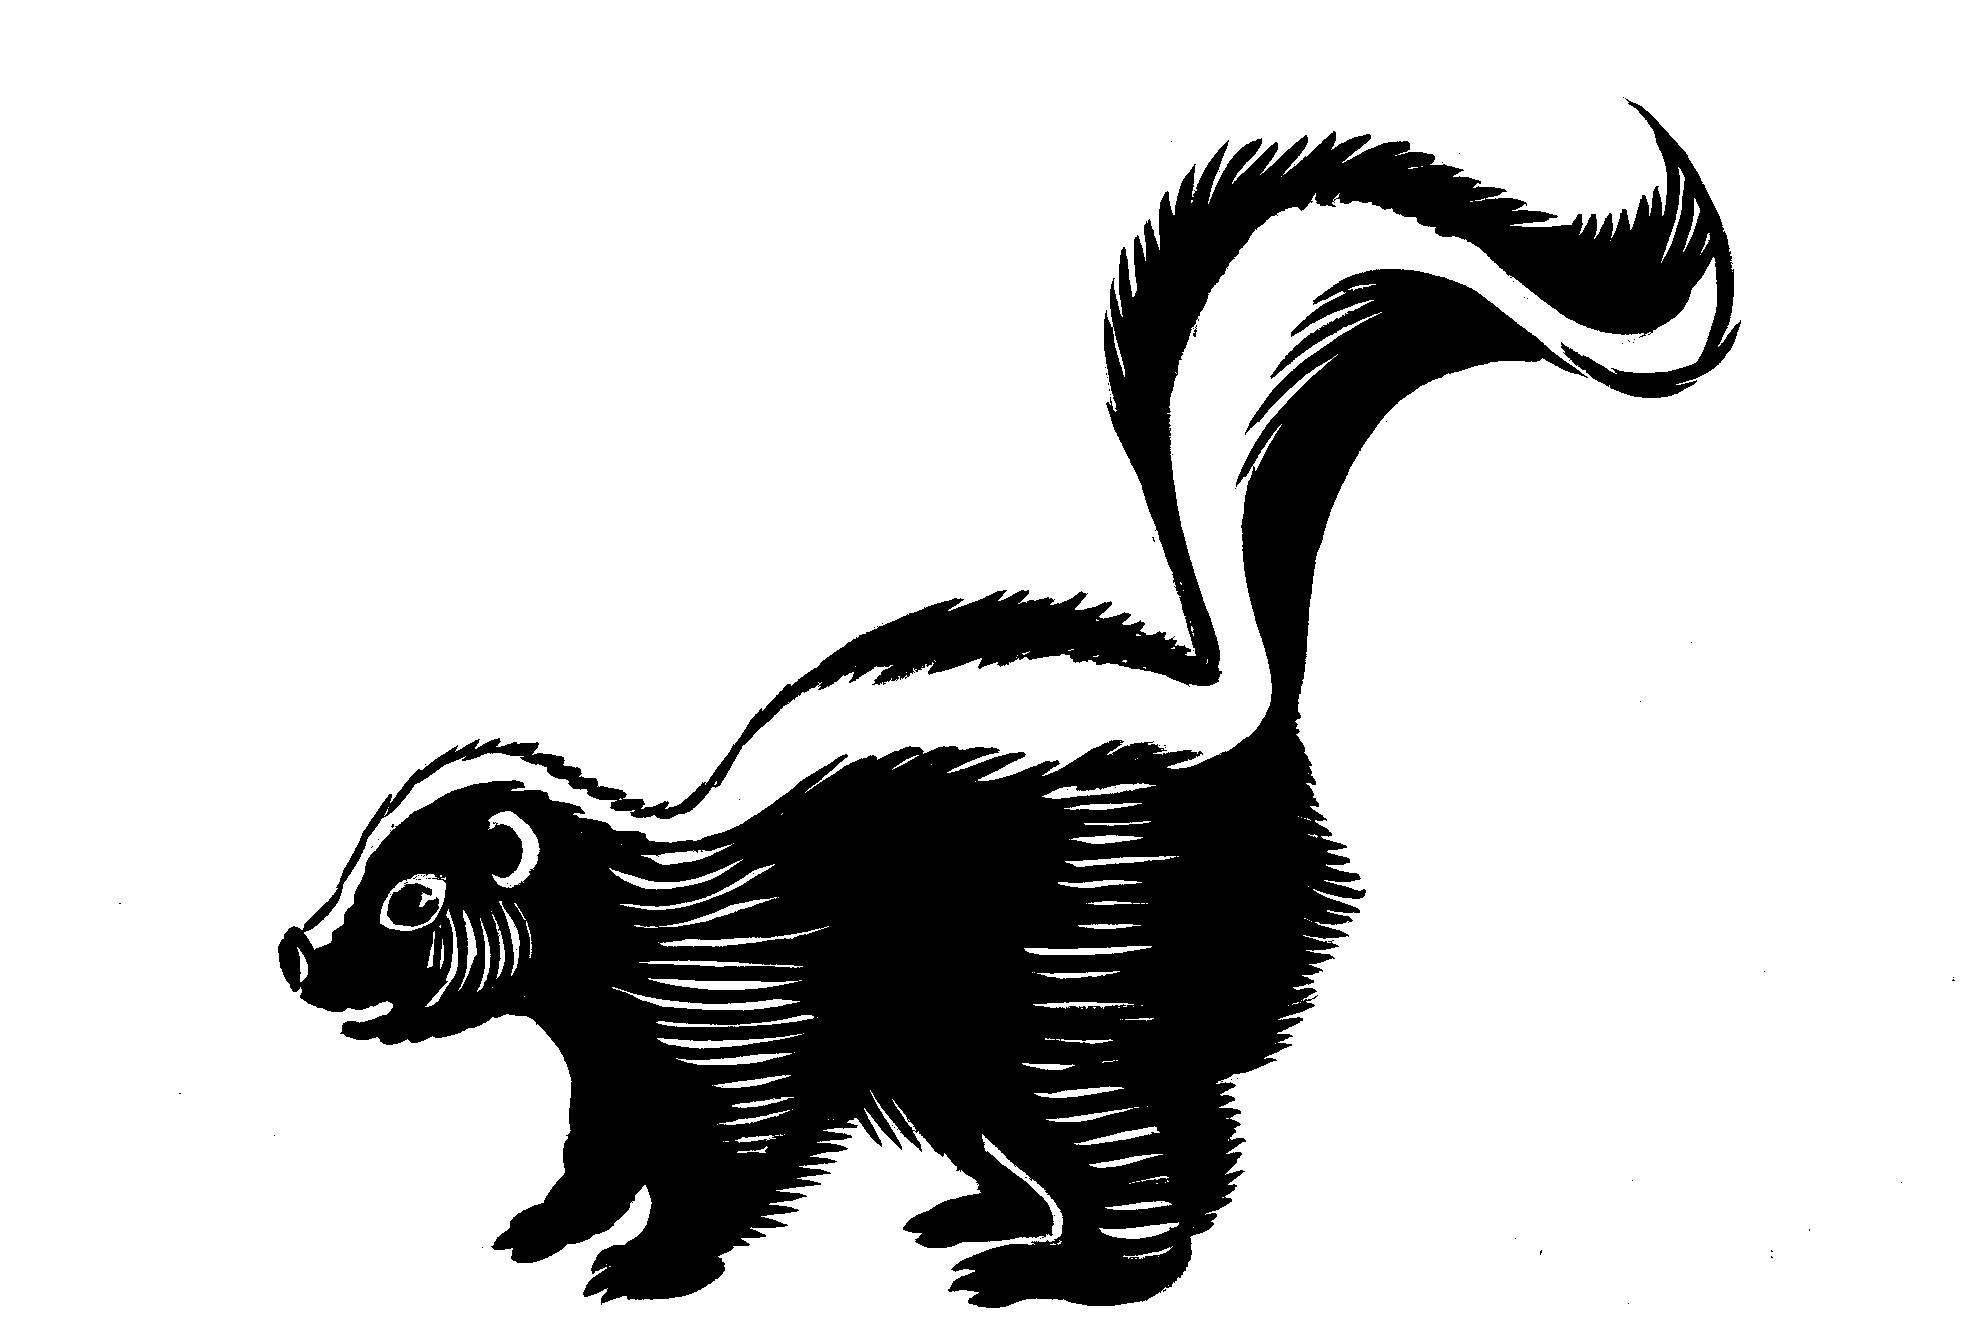 Stinky Skunk Cartoon Clipart Free Clip A-Stinky Skunk Cartoon Clipart Free Clip Art Images-5